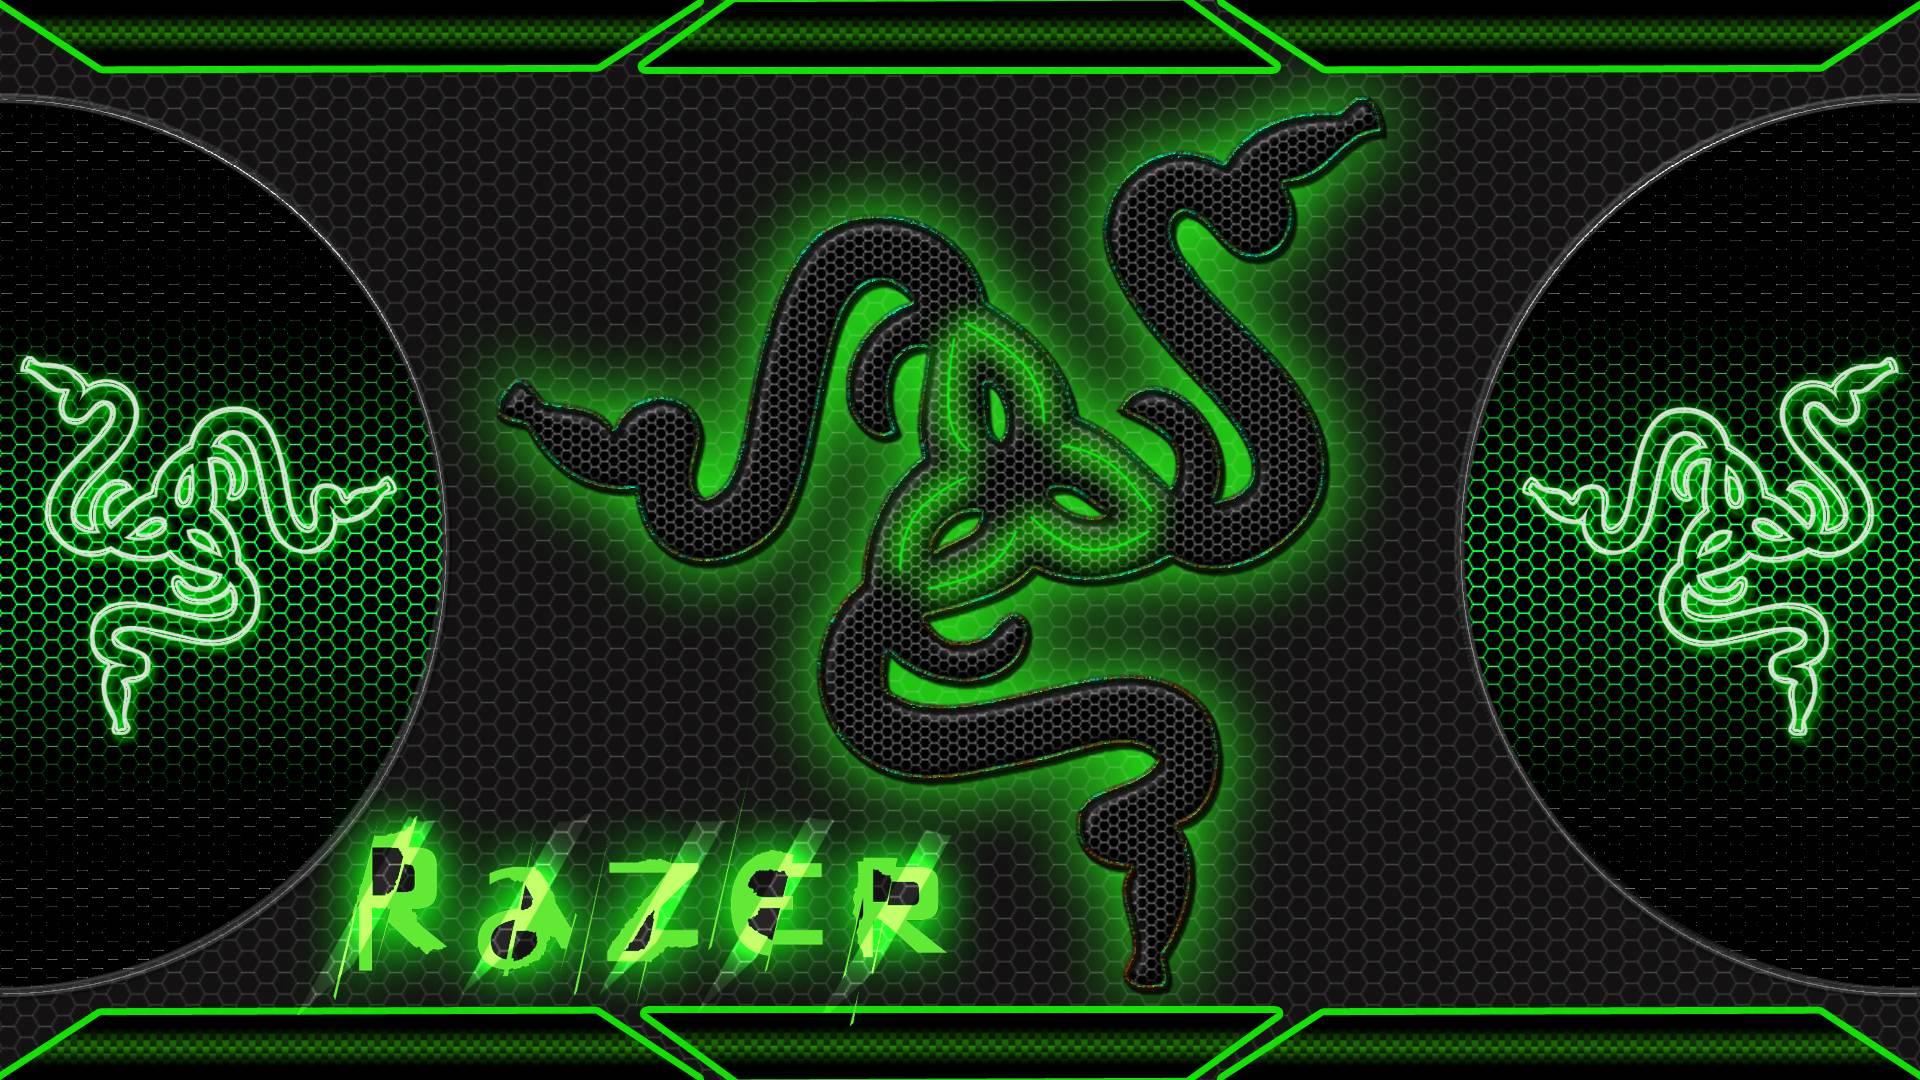 Razer desktop backgrounds wallpaper cave for Sfondi razer